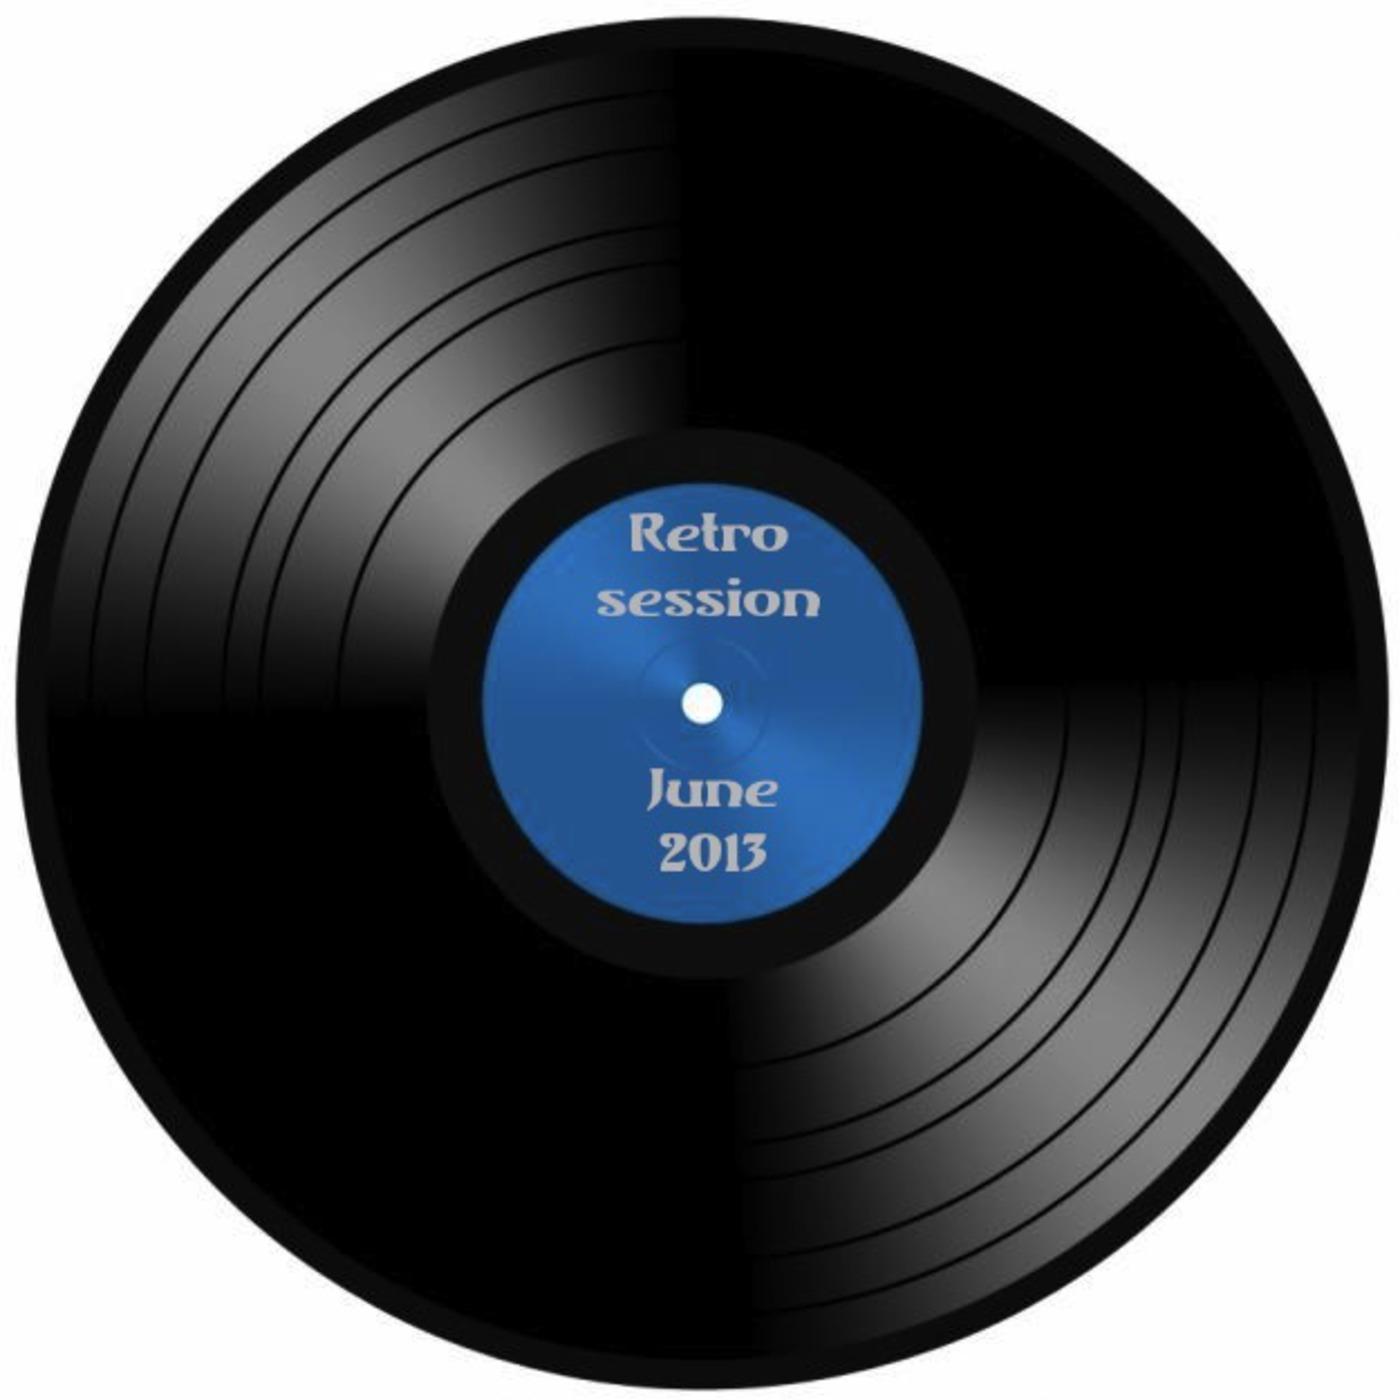 Podcast Retrô Session - Luiz Cláudio Borges